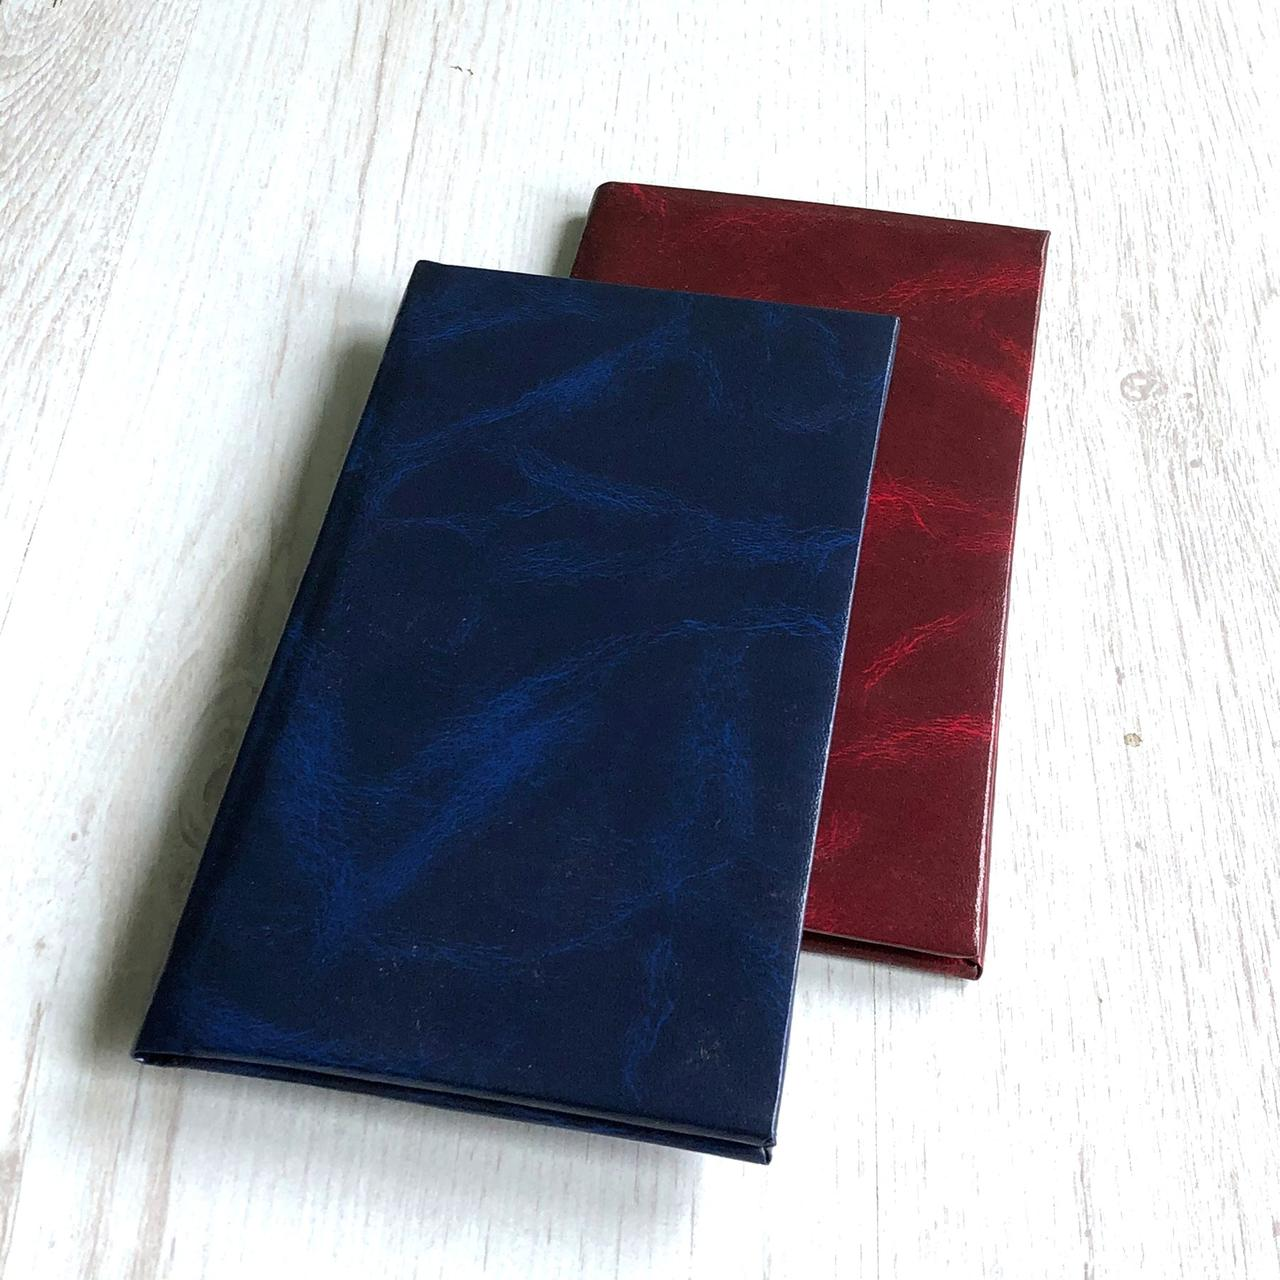 Папка-рахунок А6 Скат Бордо 11,5х21 см. ПП-7